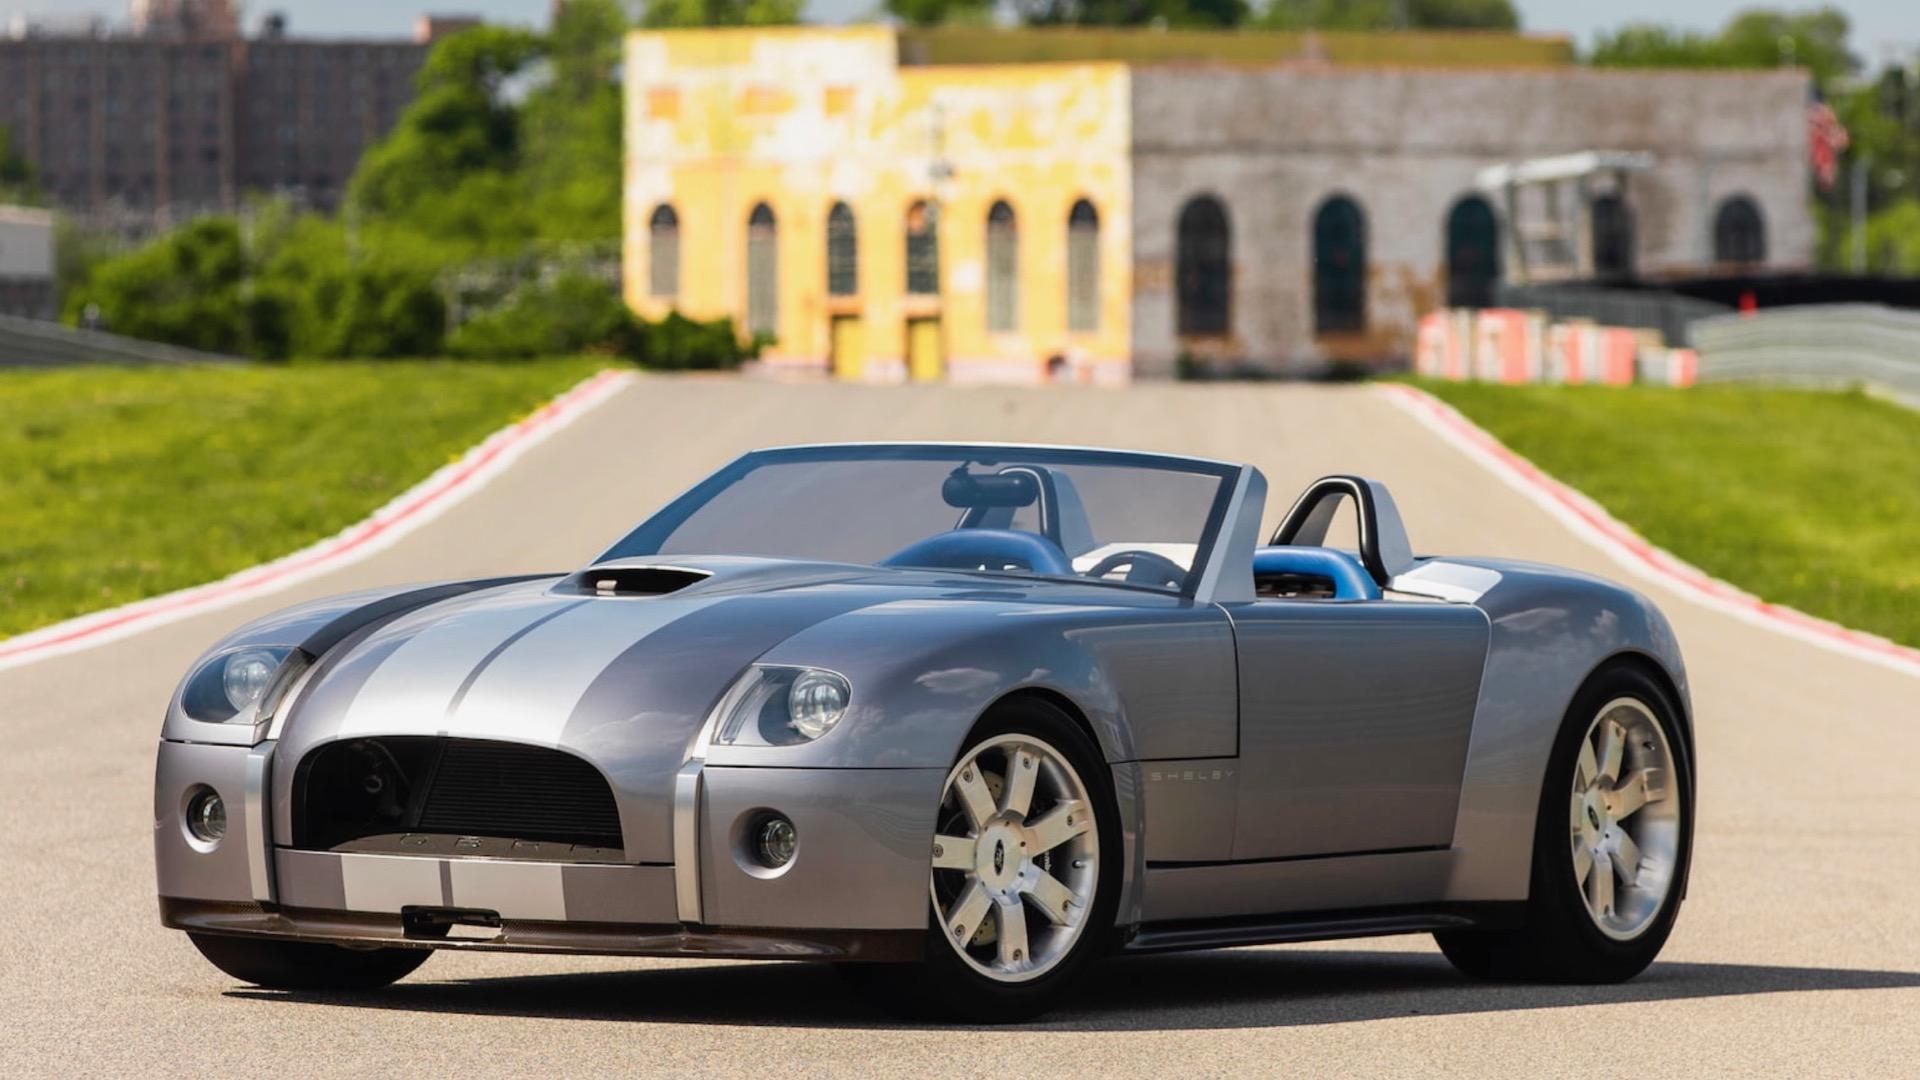 Ford Shelby Cobra Concept 2004